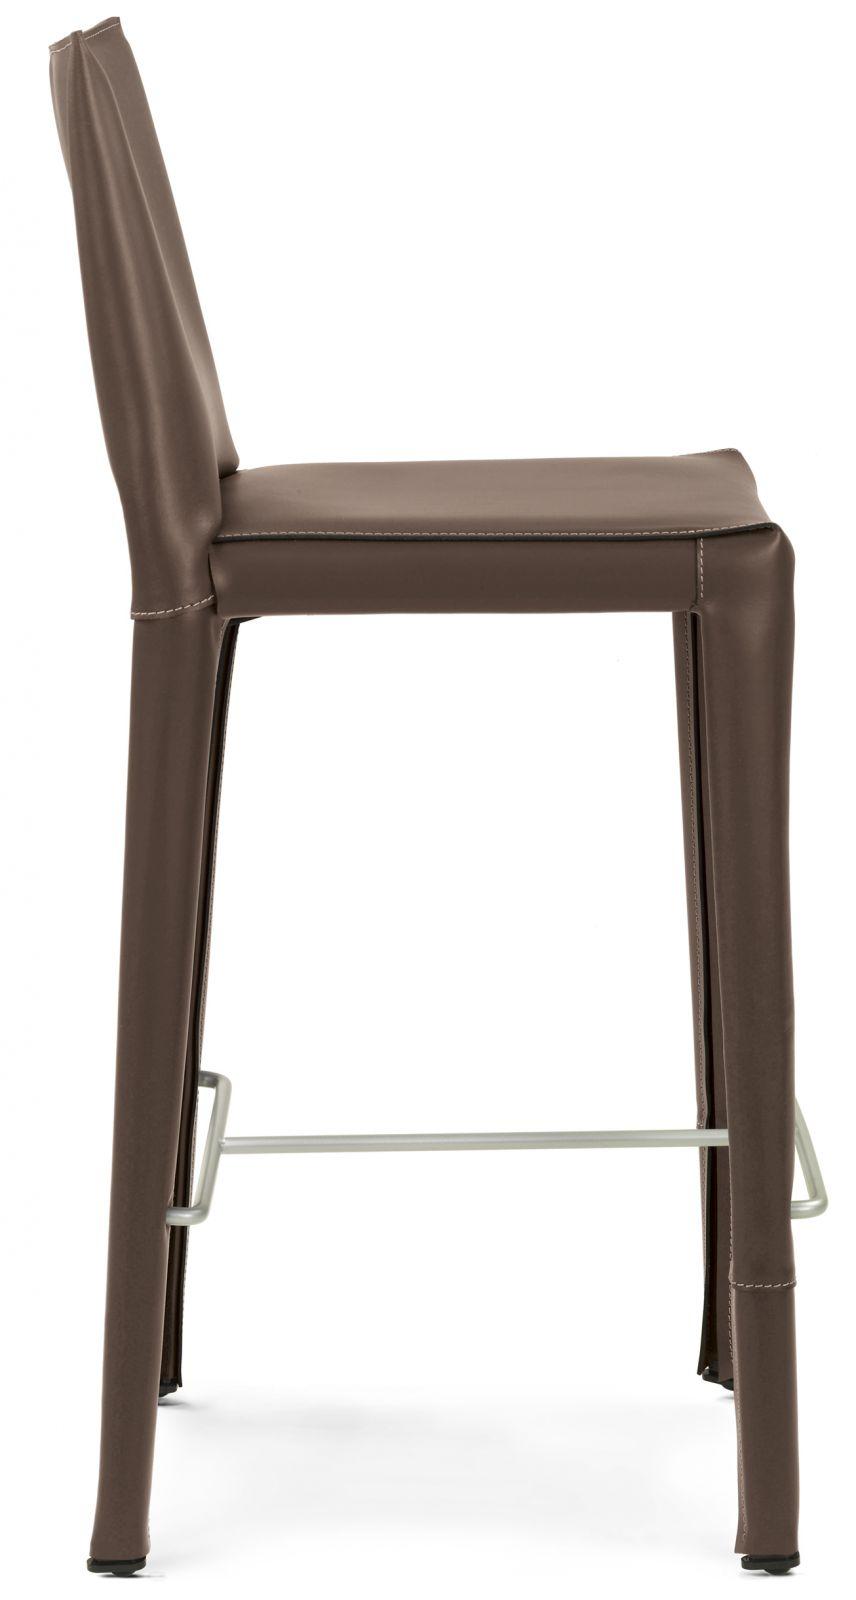 modern-bar-stools-Italian-furniture-large (26).jpg